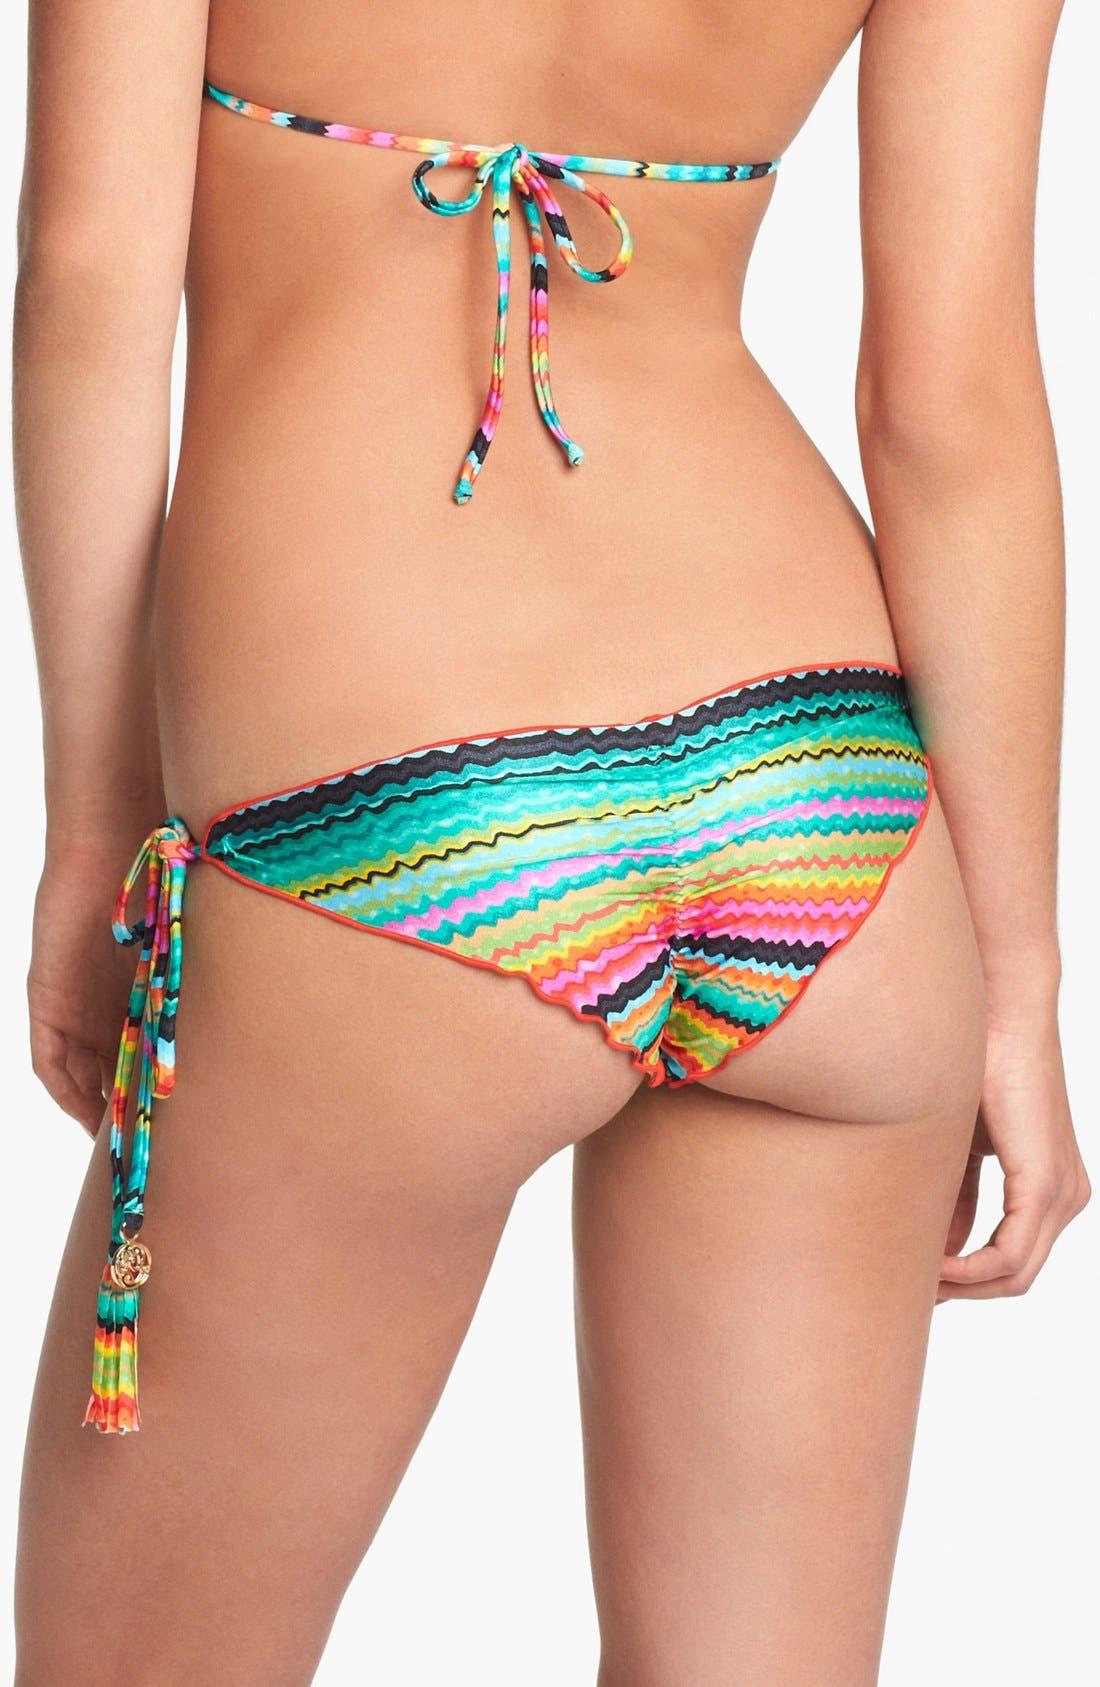 Alternate Image 1 Selected - Luli Fama 'Hola Verano' Side Tie Bikini Bottoms